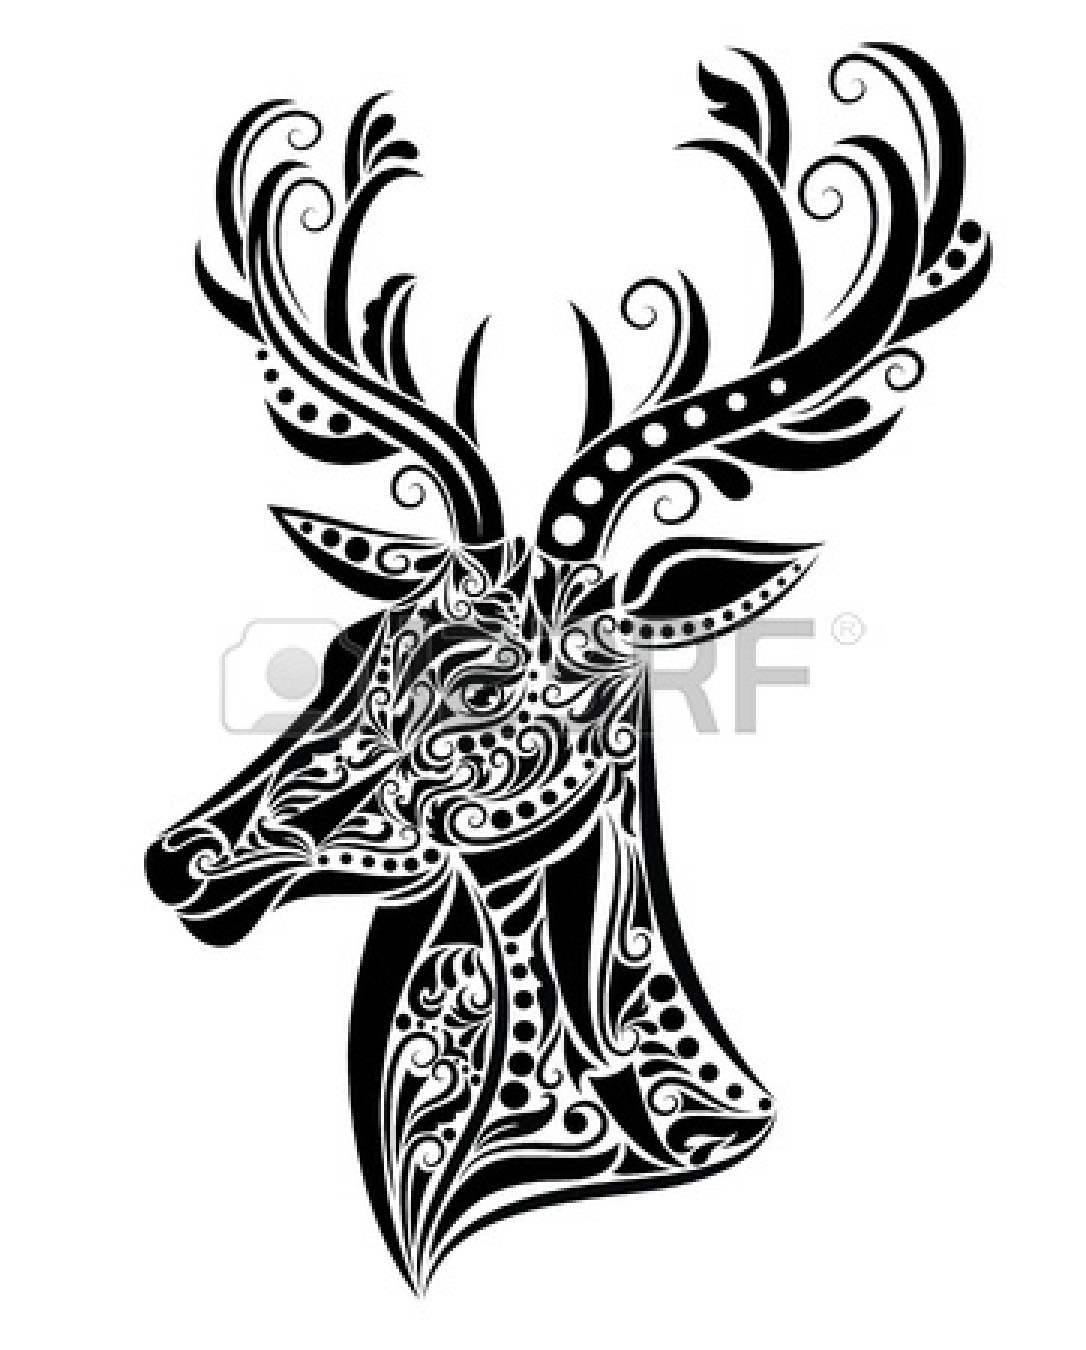 1086x1350 Baby Deer Silhouette Clip Art Clipart Panda